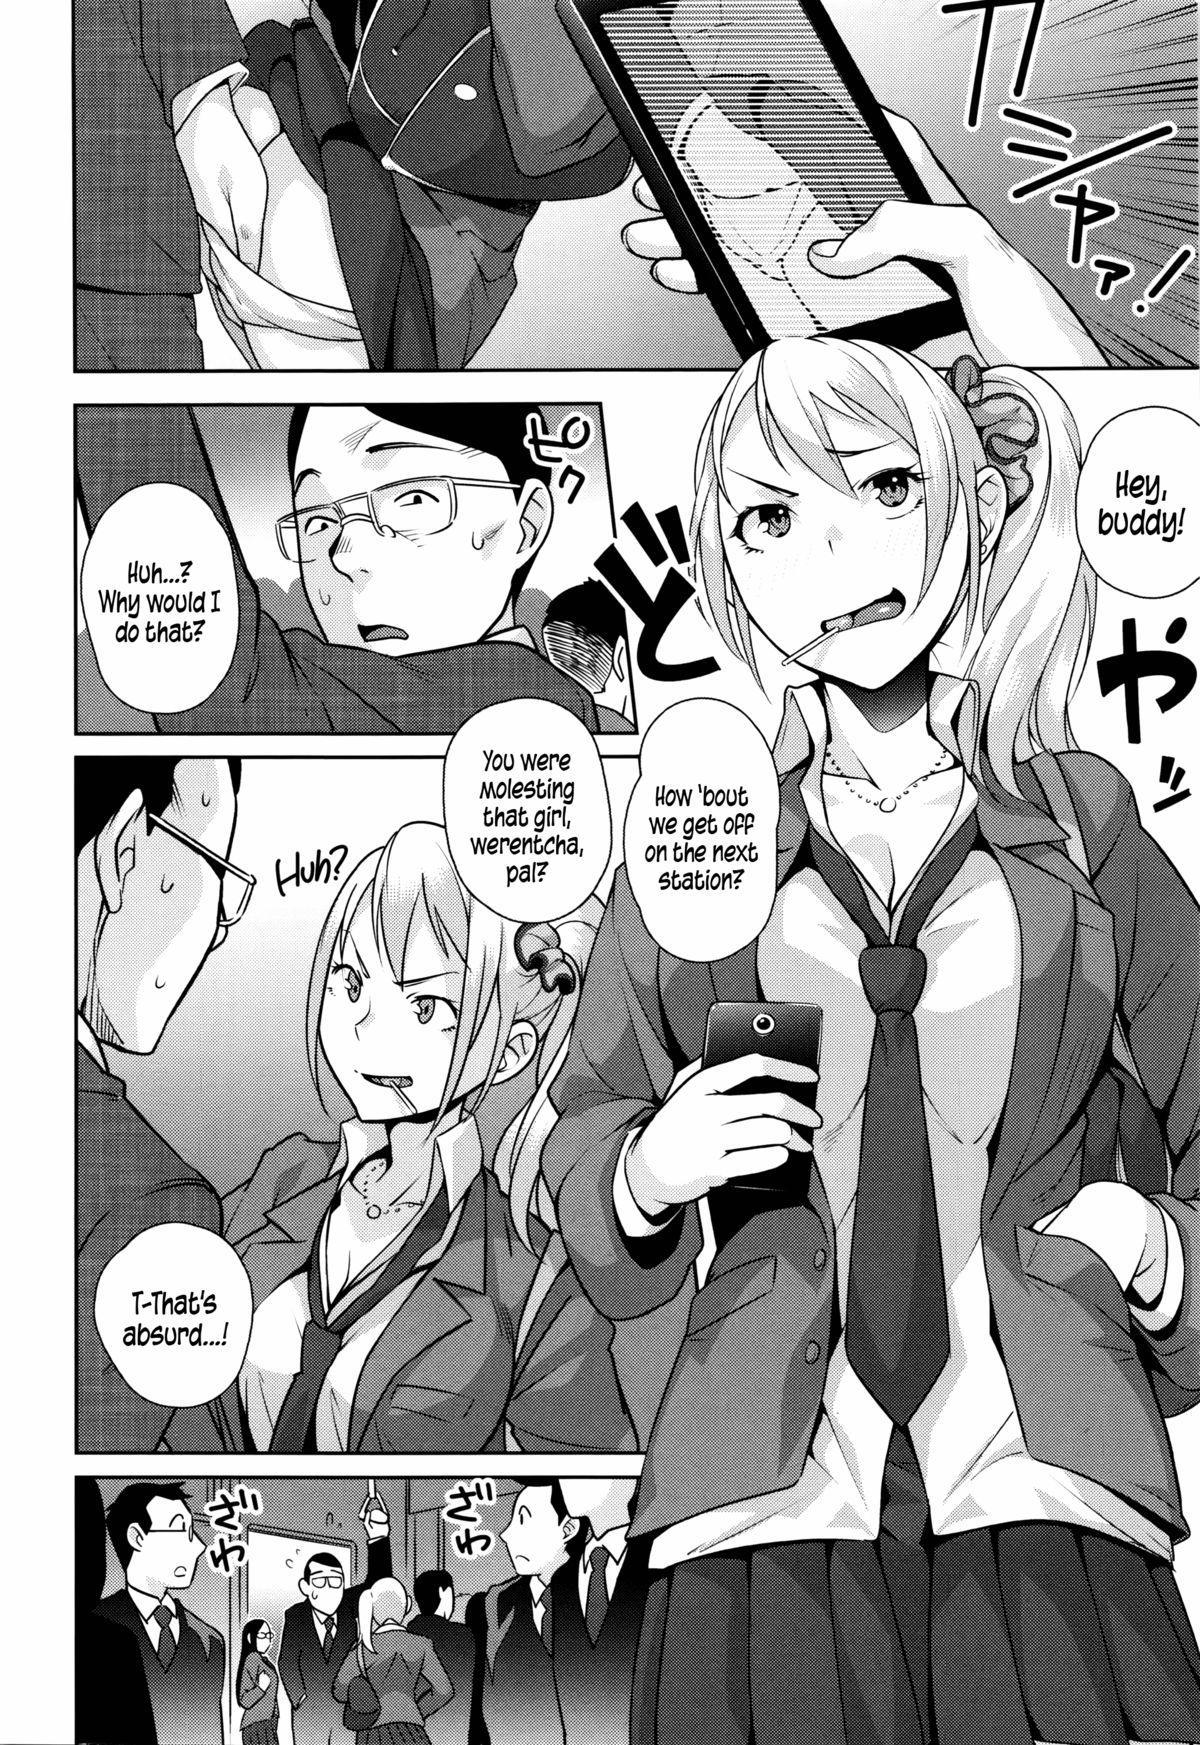 Hatsujou! Namaiki JK | Horny! Cheeky JK 8